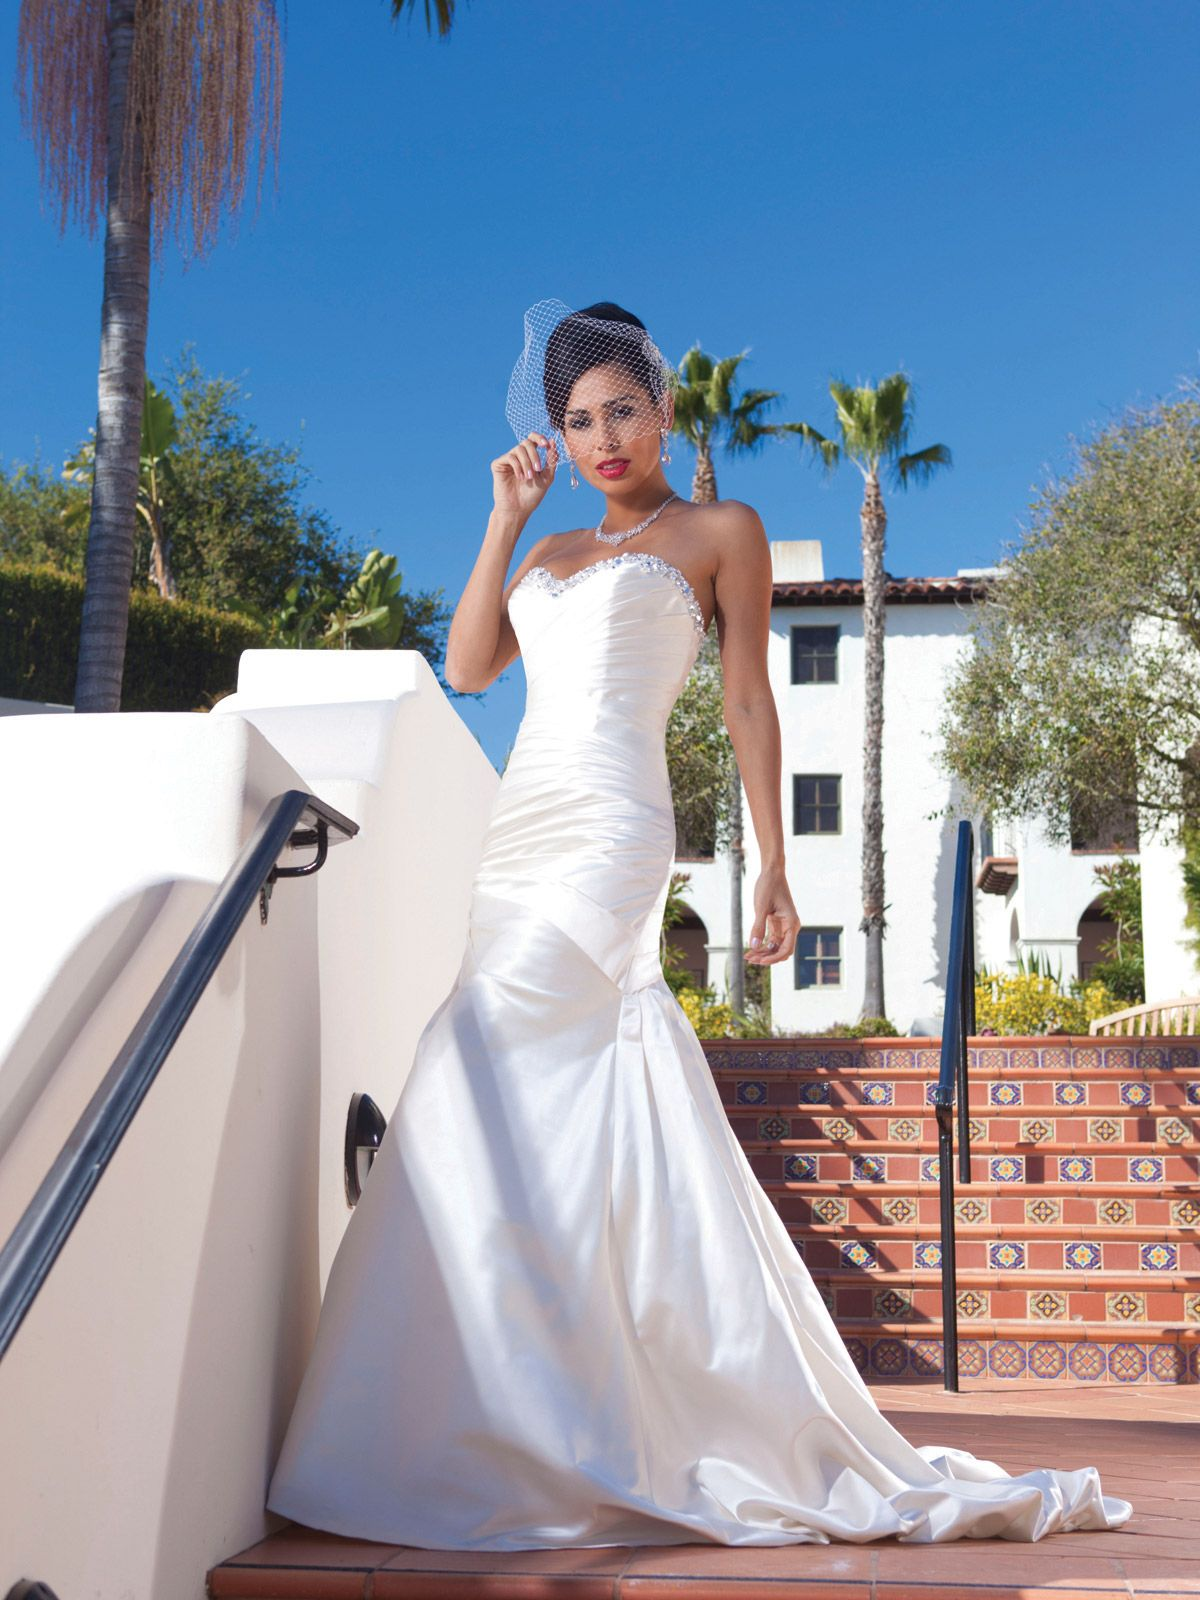 Mermaid Wedding Dress Up Games